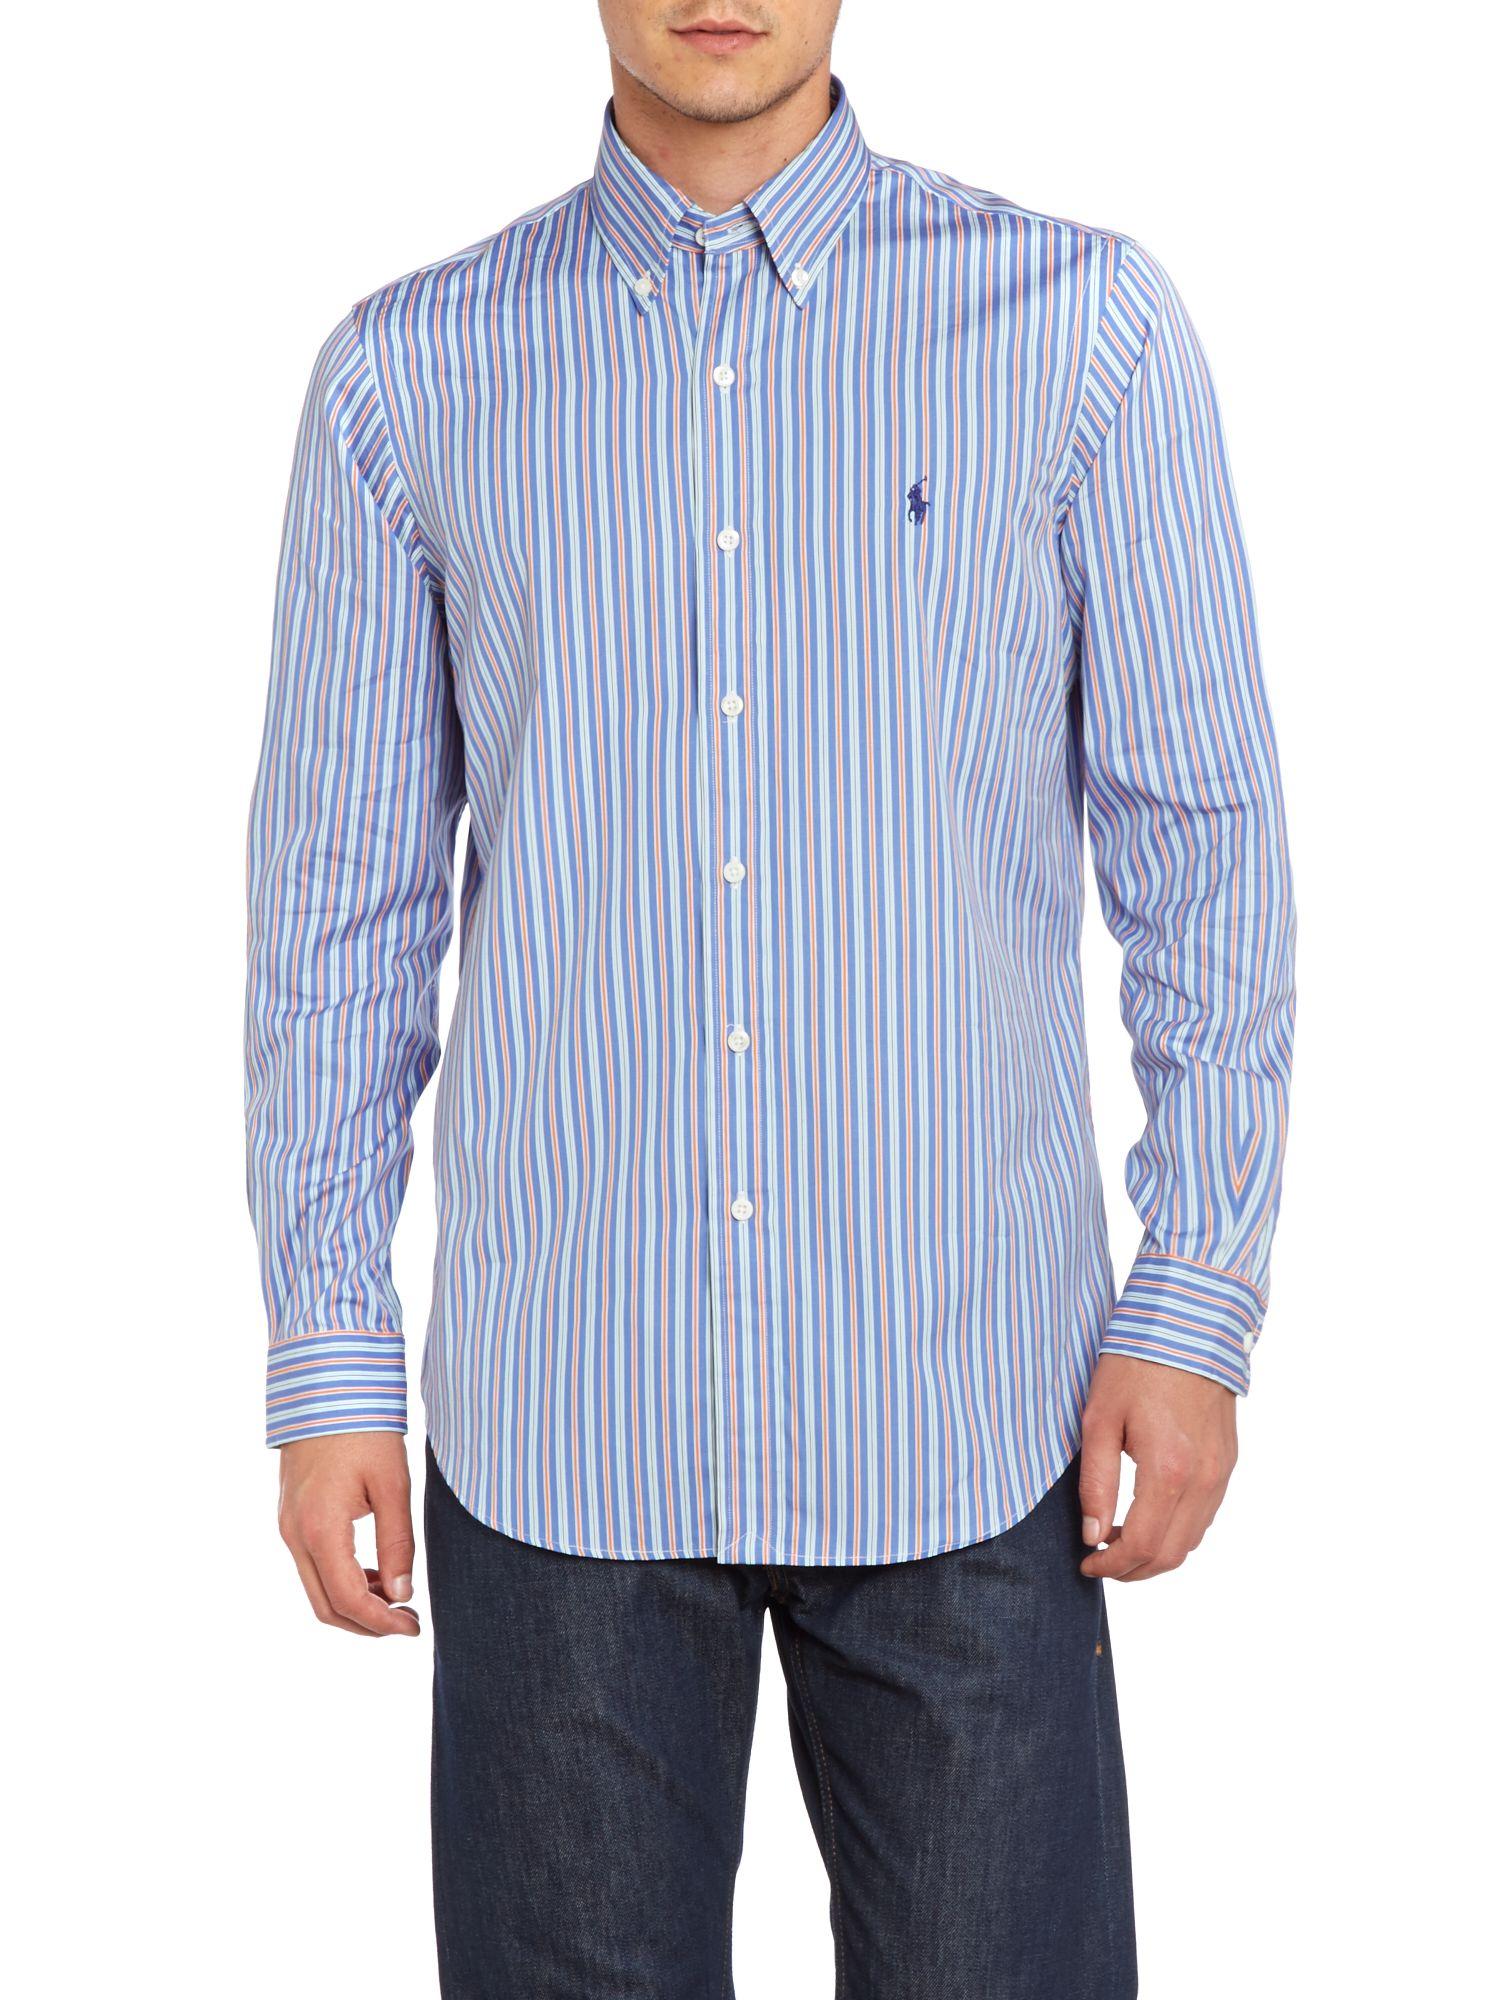 Polo ralph lauren ralph lauren custom fit poplin striped for Custom fit dress shirts